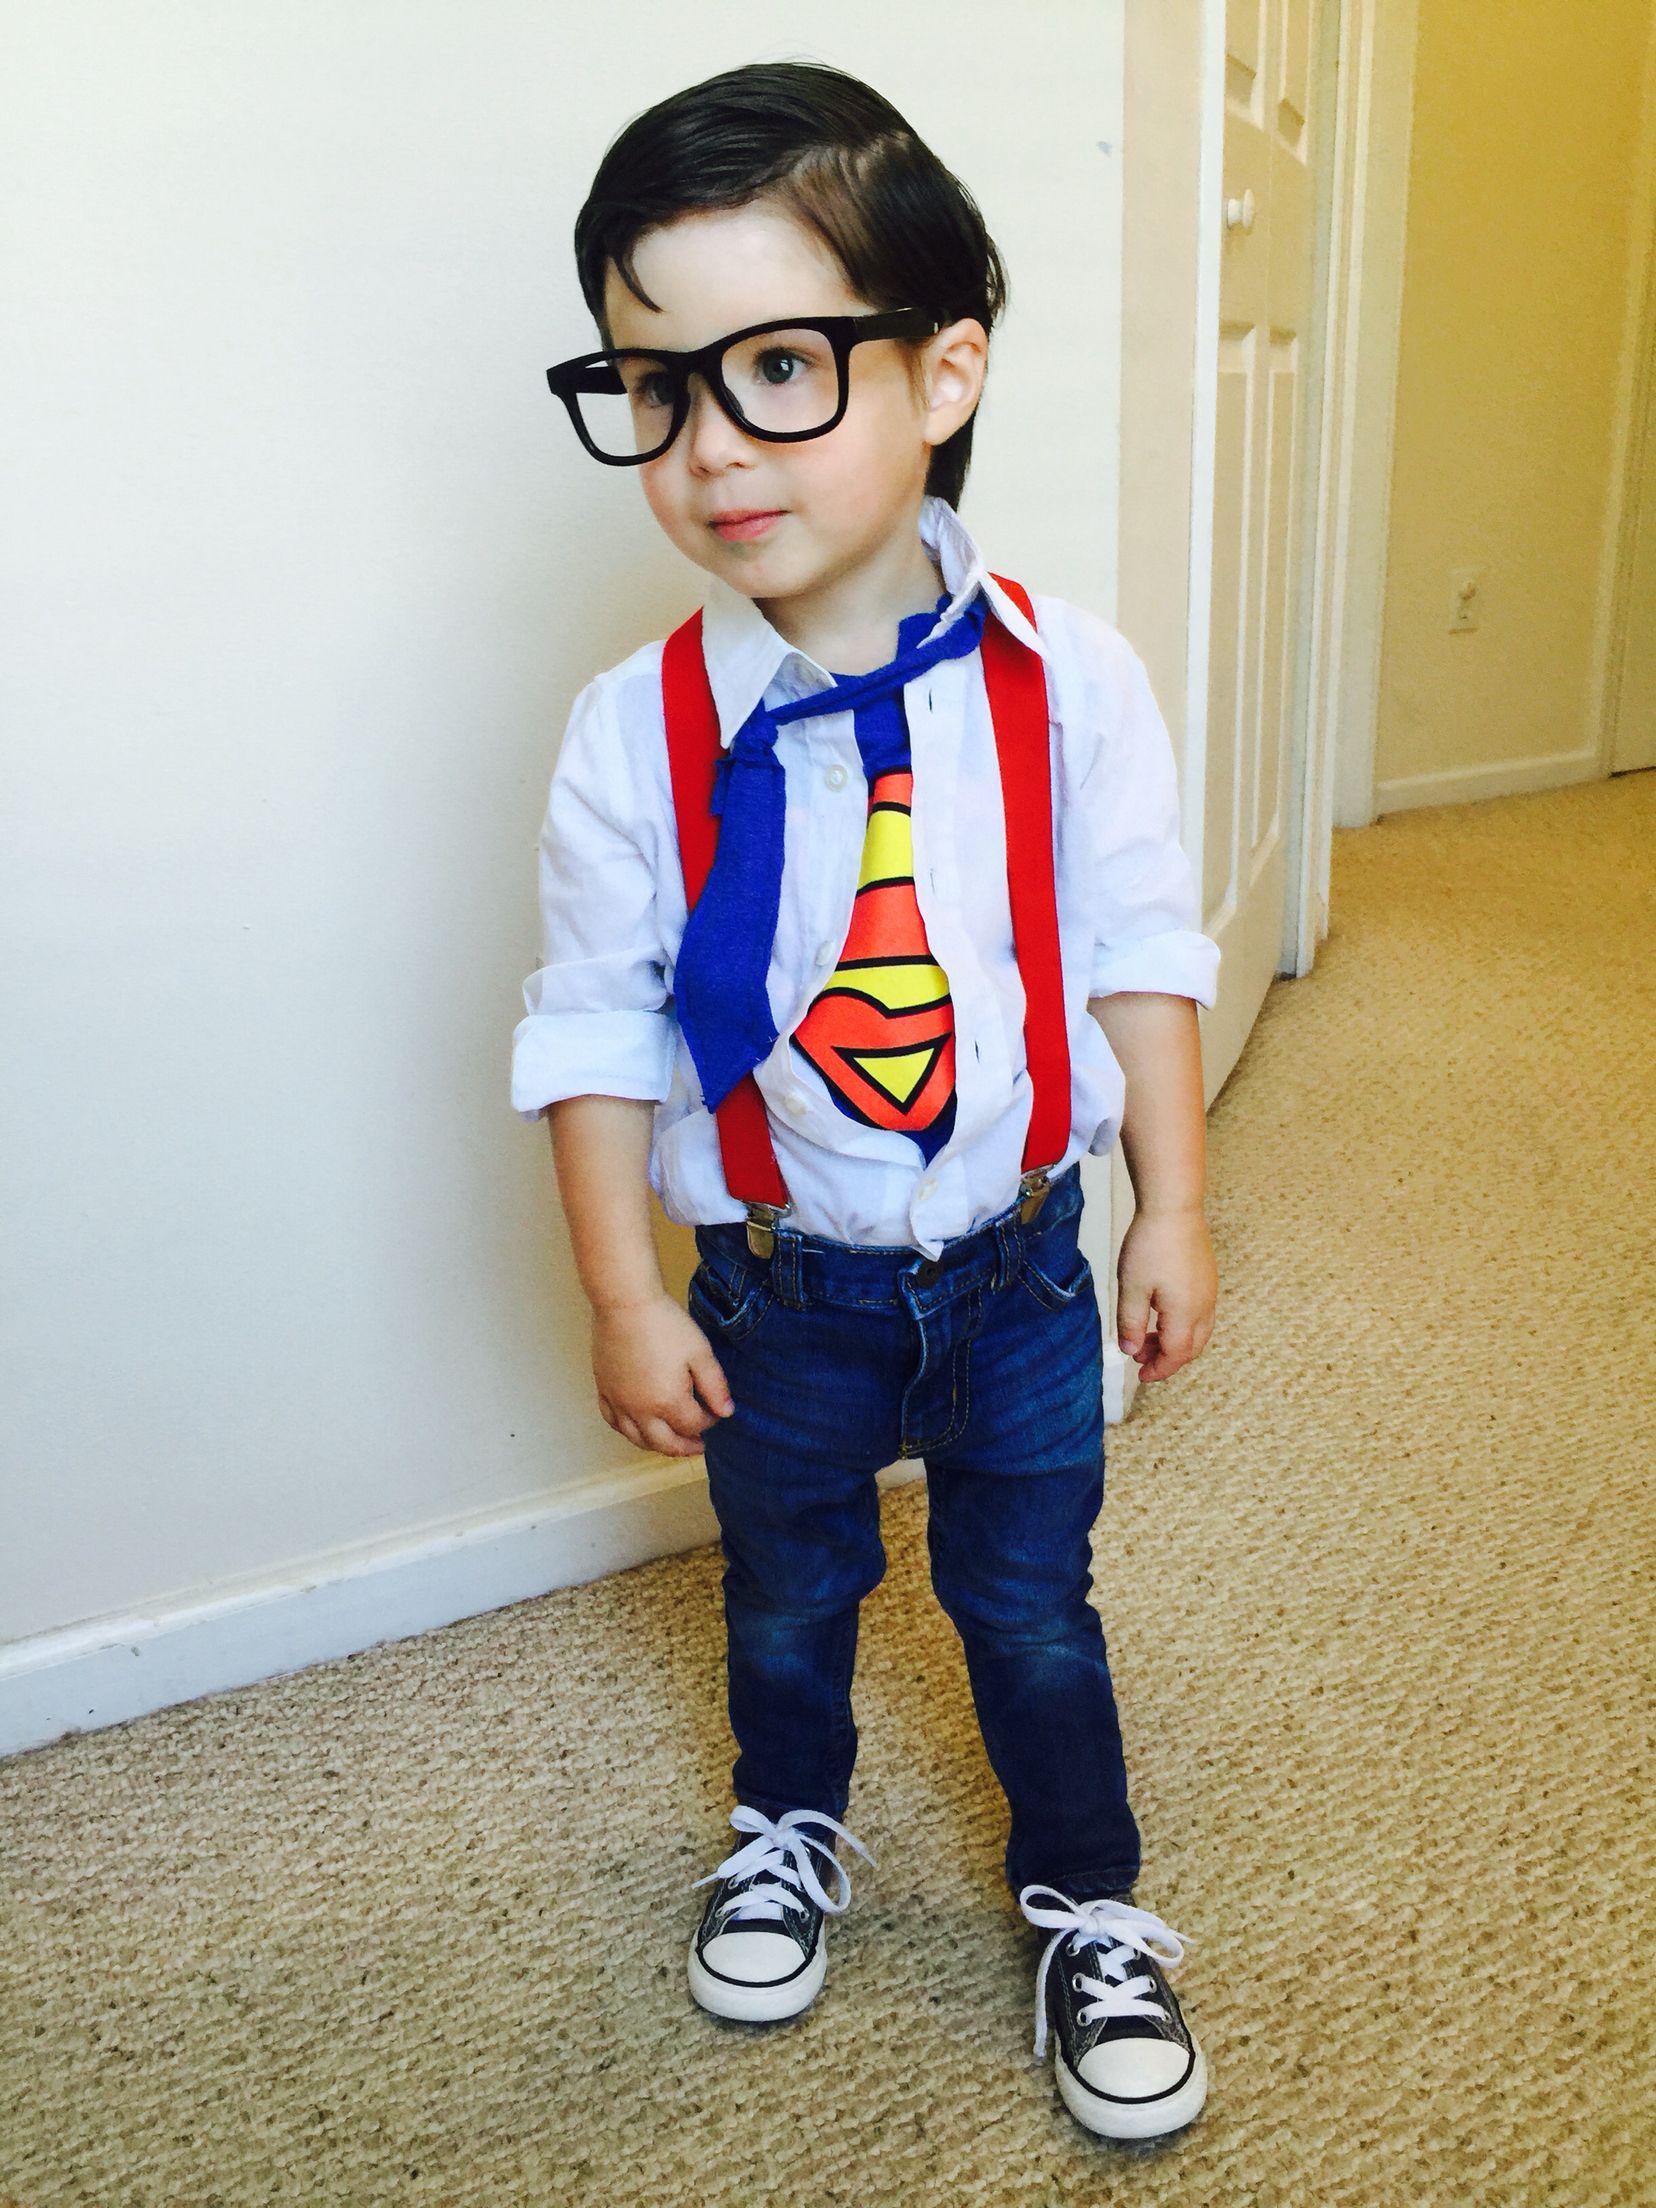 Toddler version of #clarkkent #toddlersuperman #superkid ...